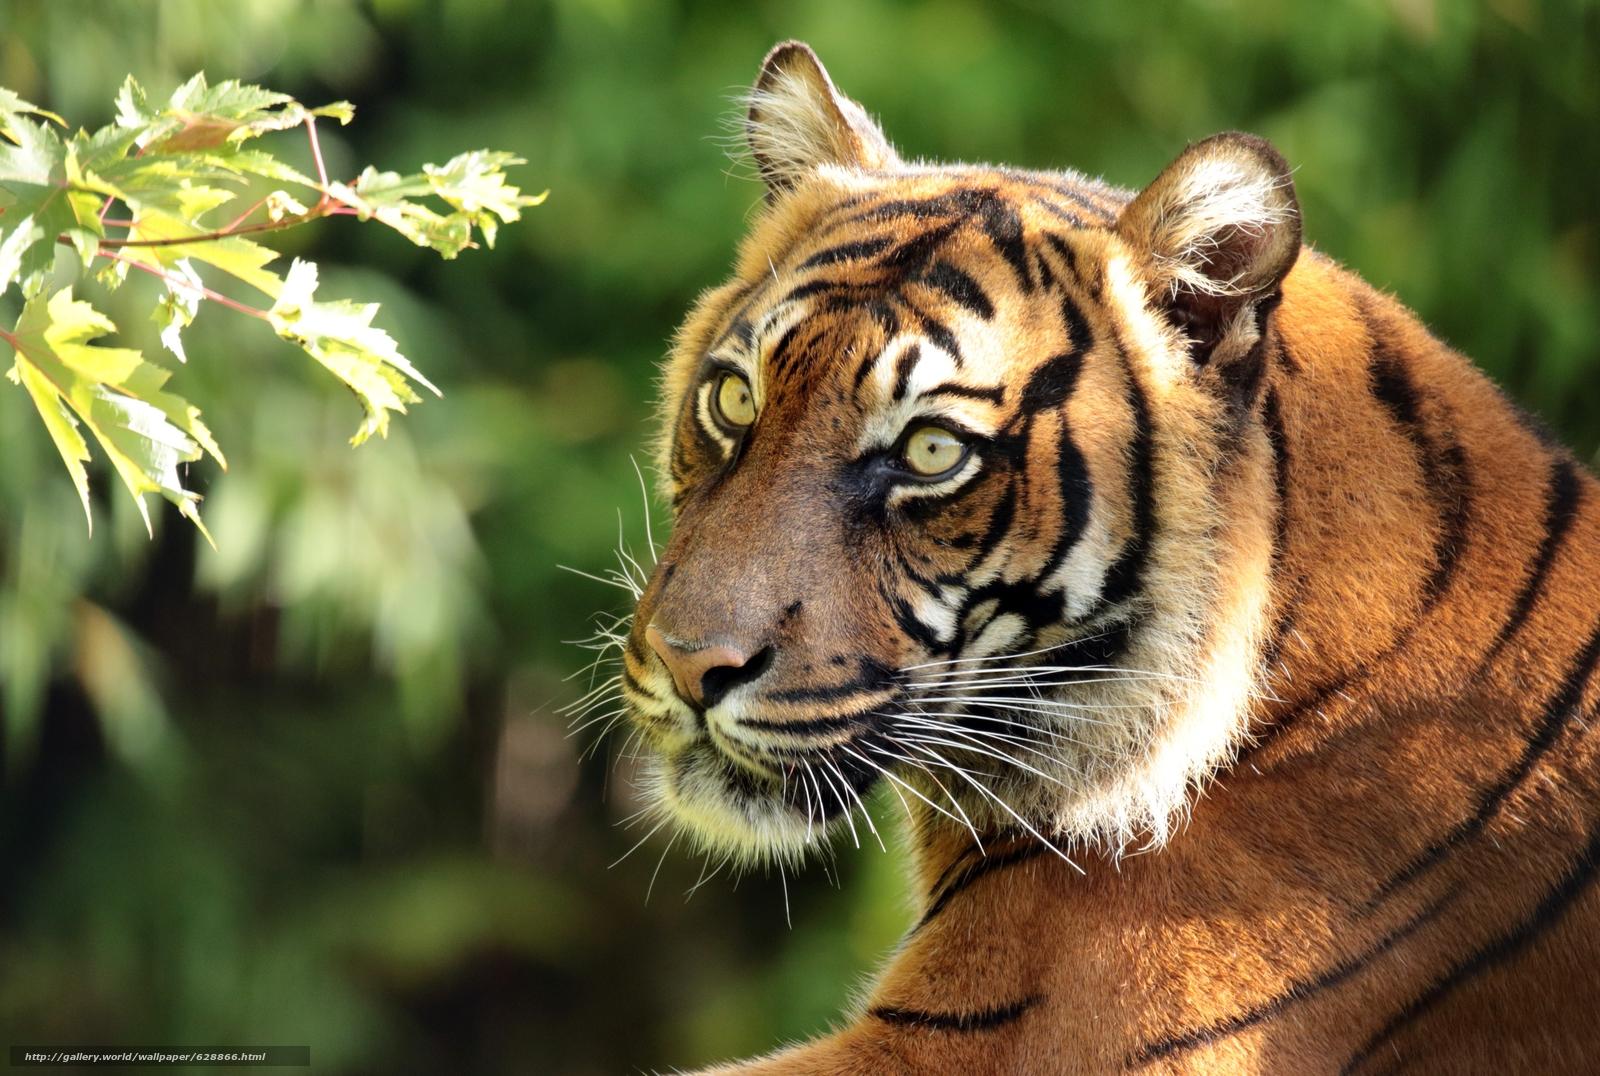 Суматранский тигр, тигр, хищник, морда, портрет, ветка